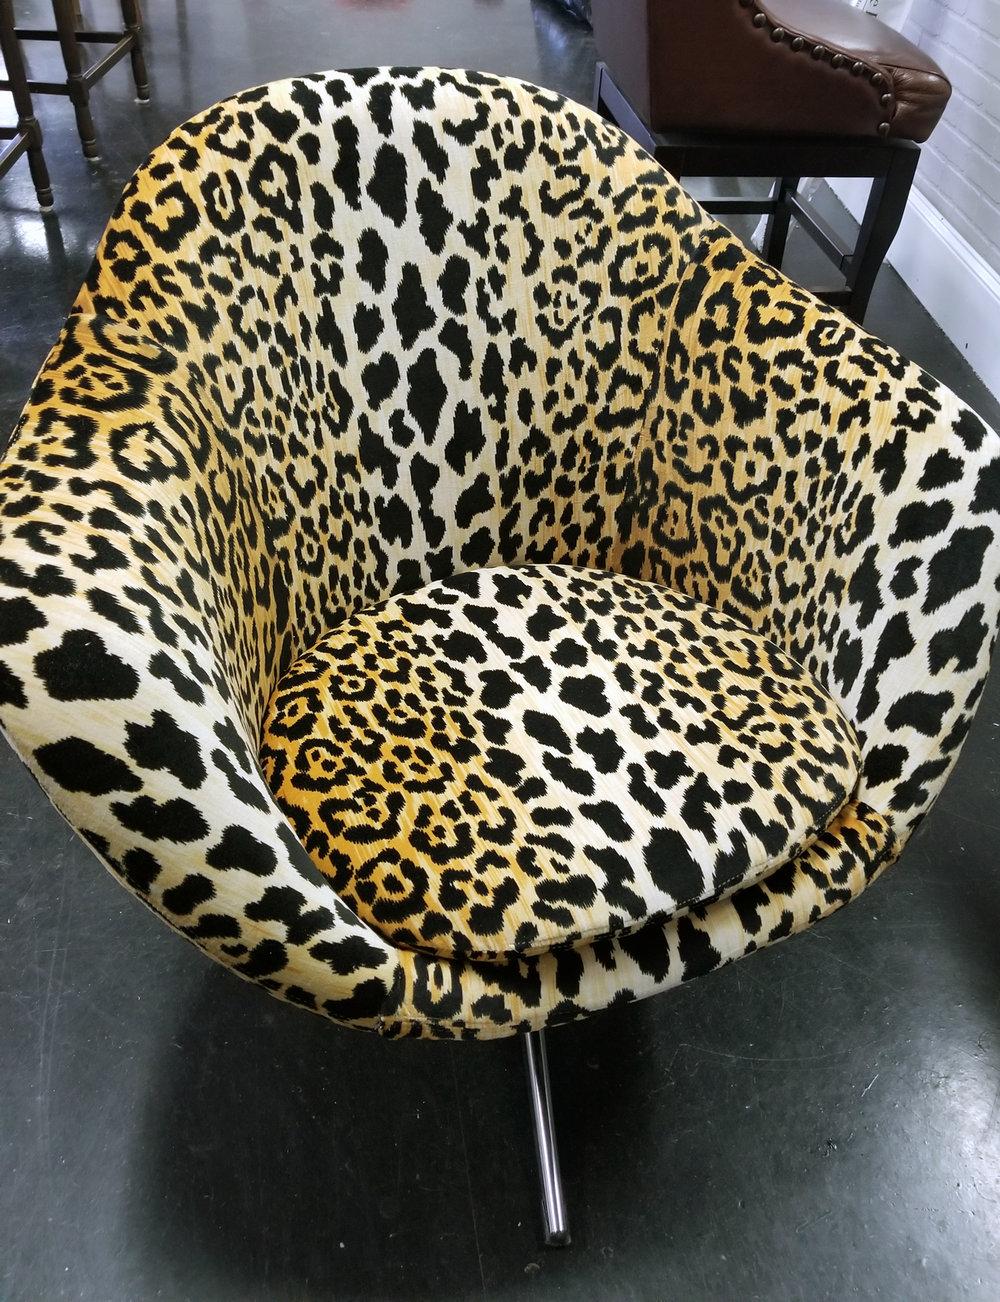 centuryupholstery_chair2.jpg